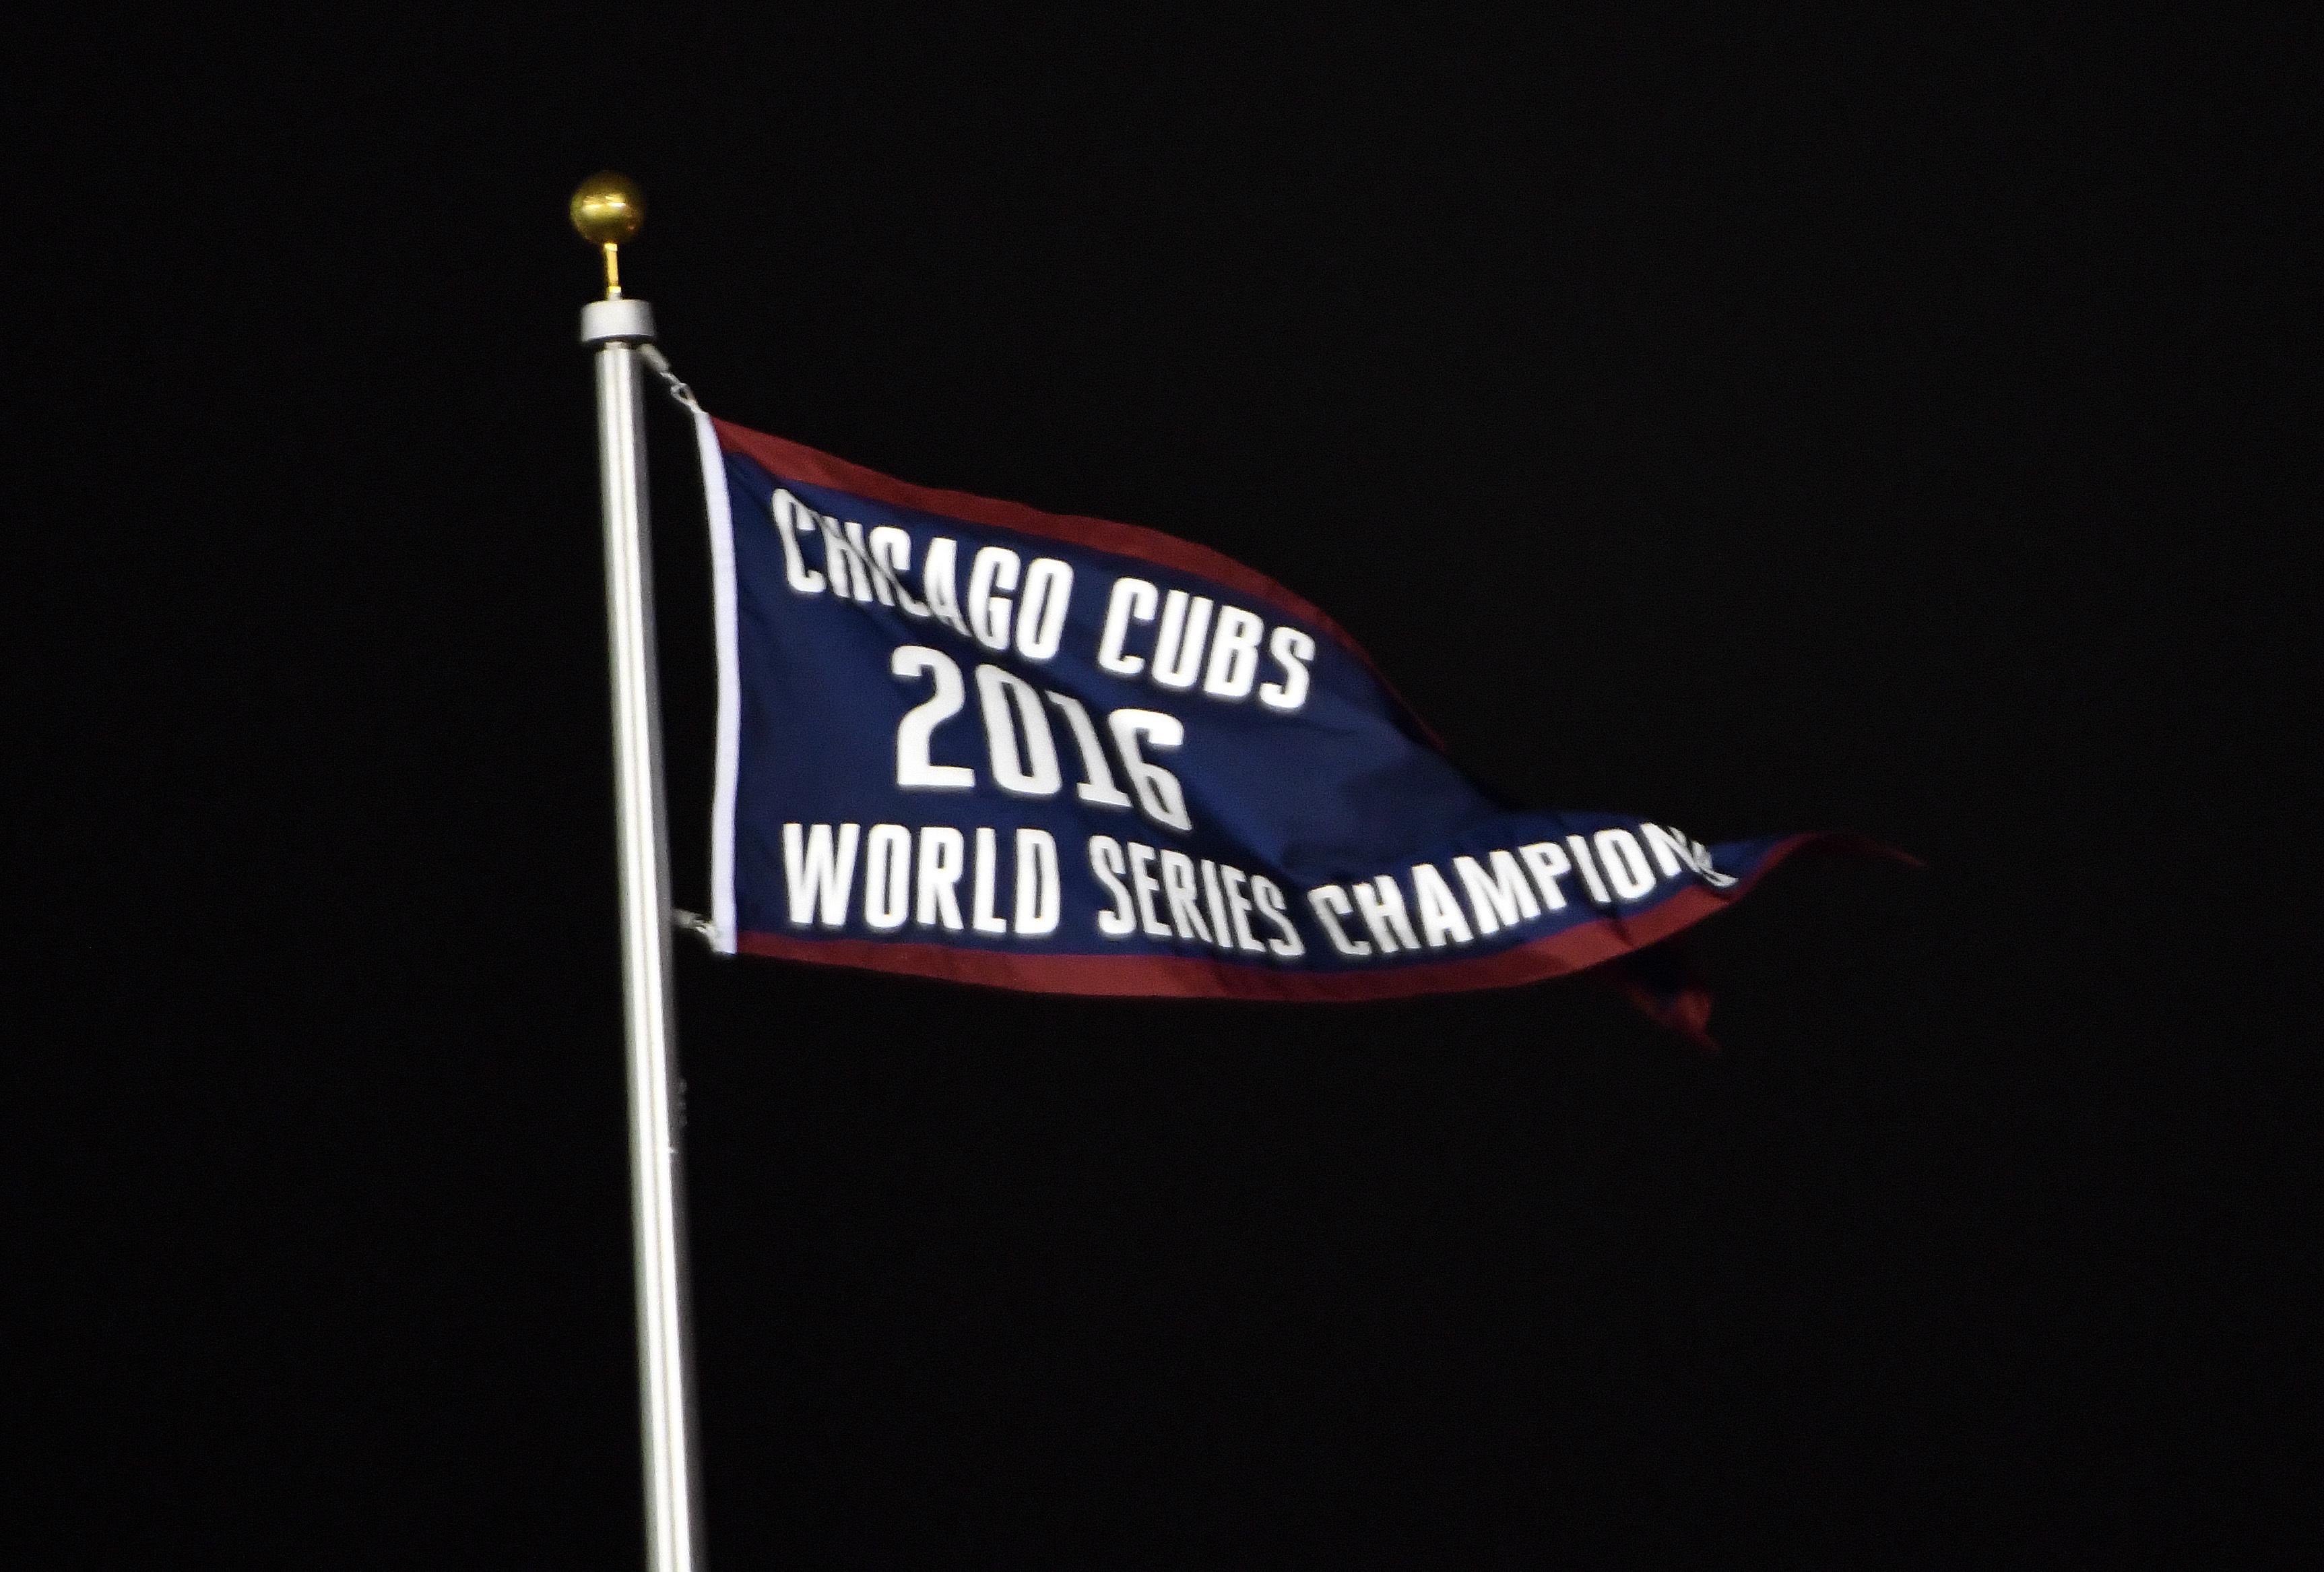 The Chicago Cubs raised their 2016 World Series Championship Flag Monday. (AP Photo/David Banks)